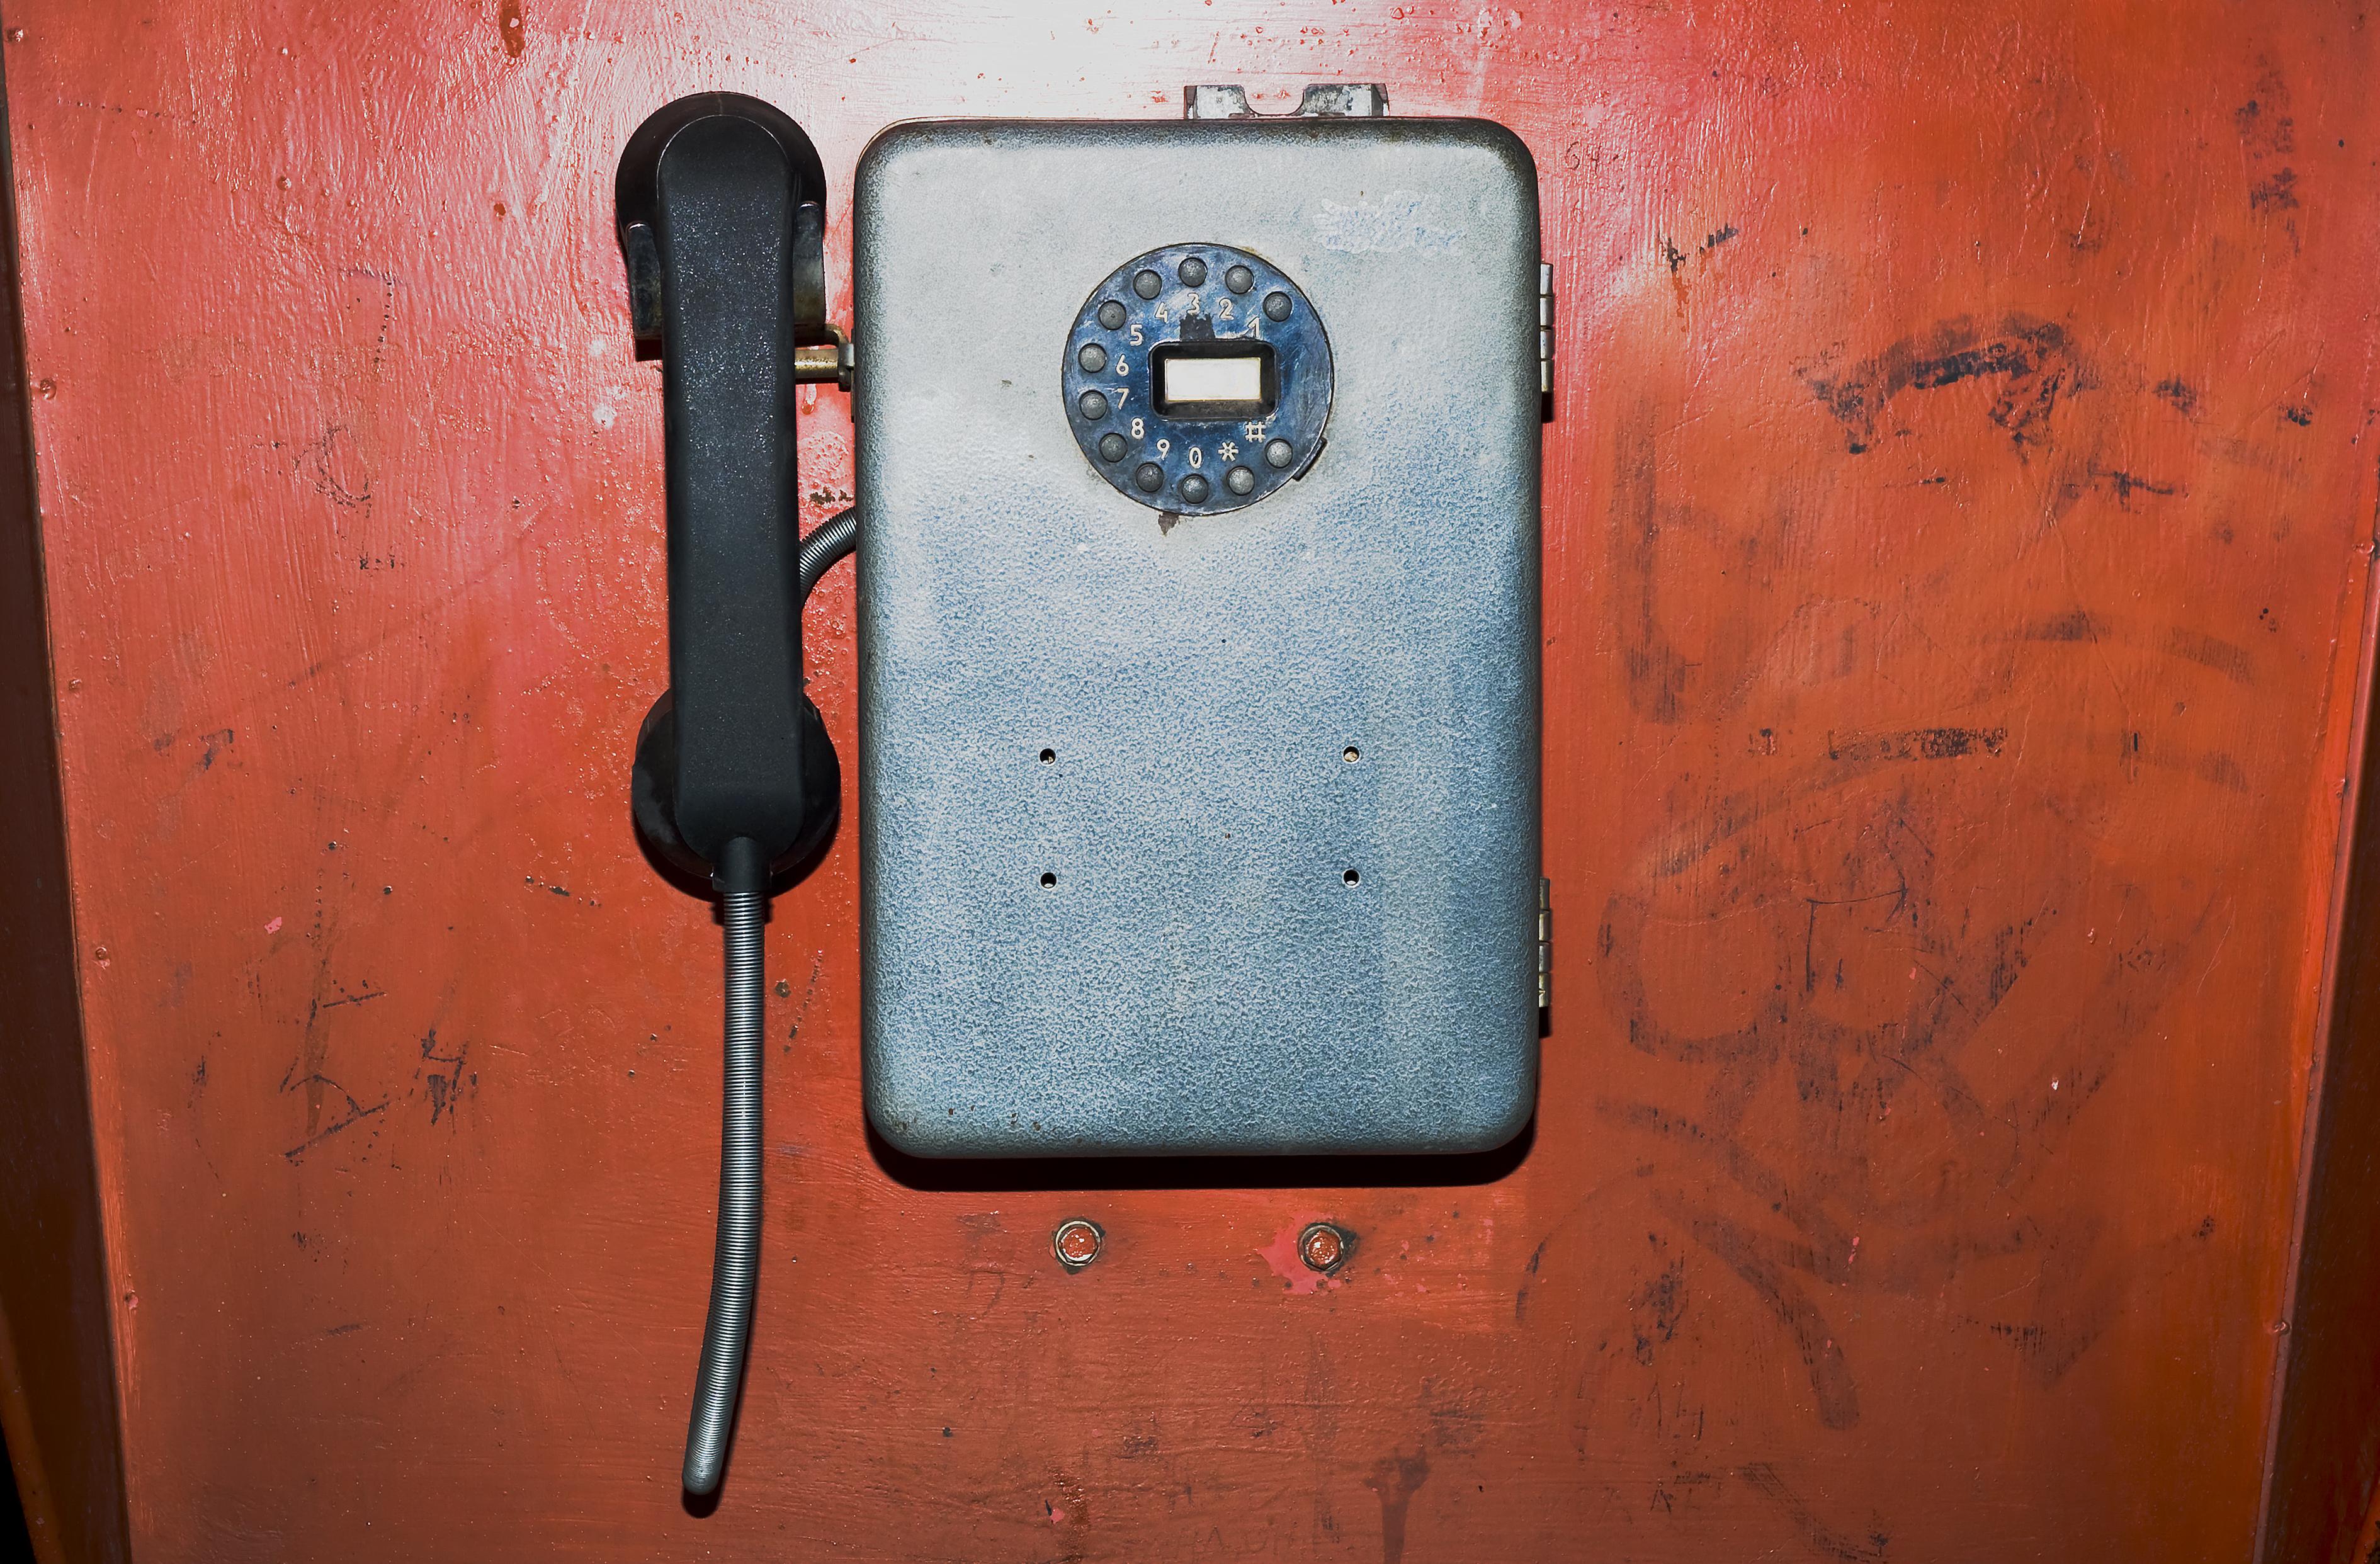 Old phone, Broken, Grunge, Red, Public, HQ Photo